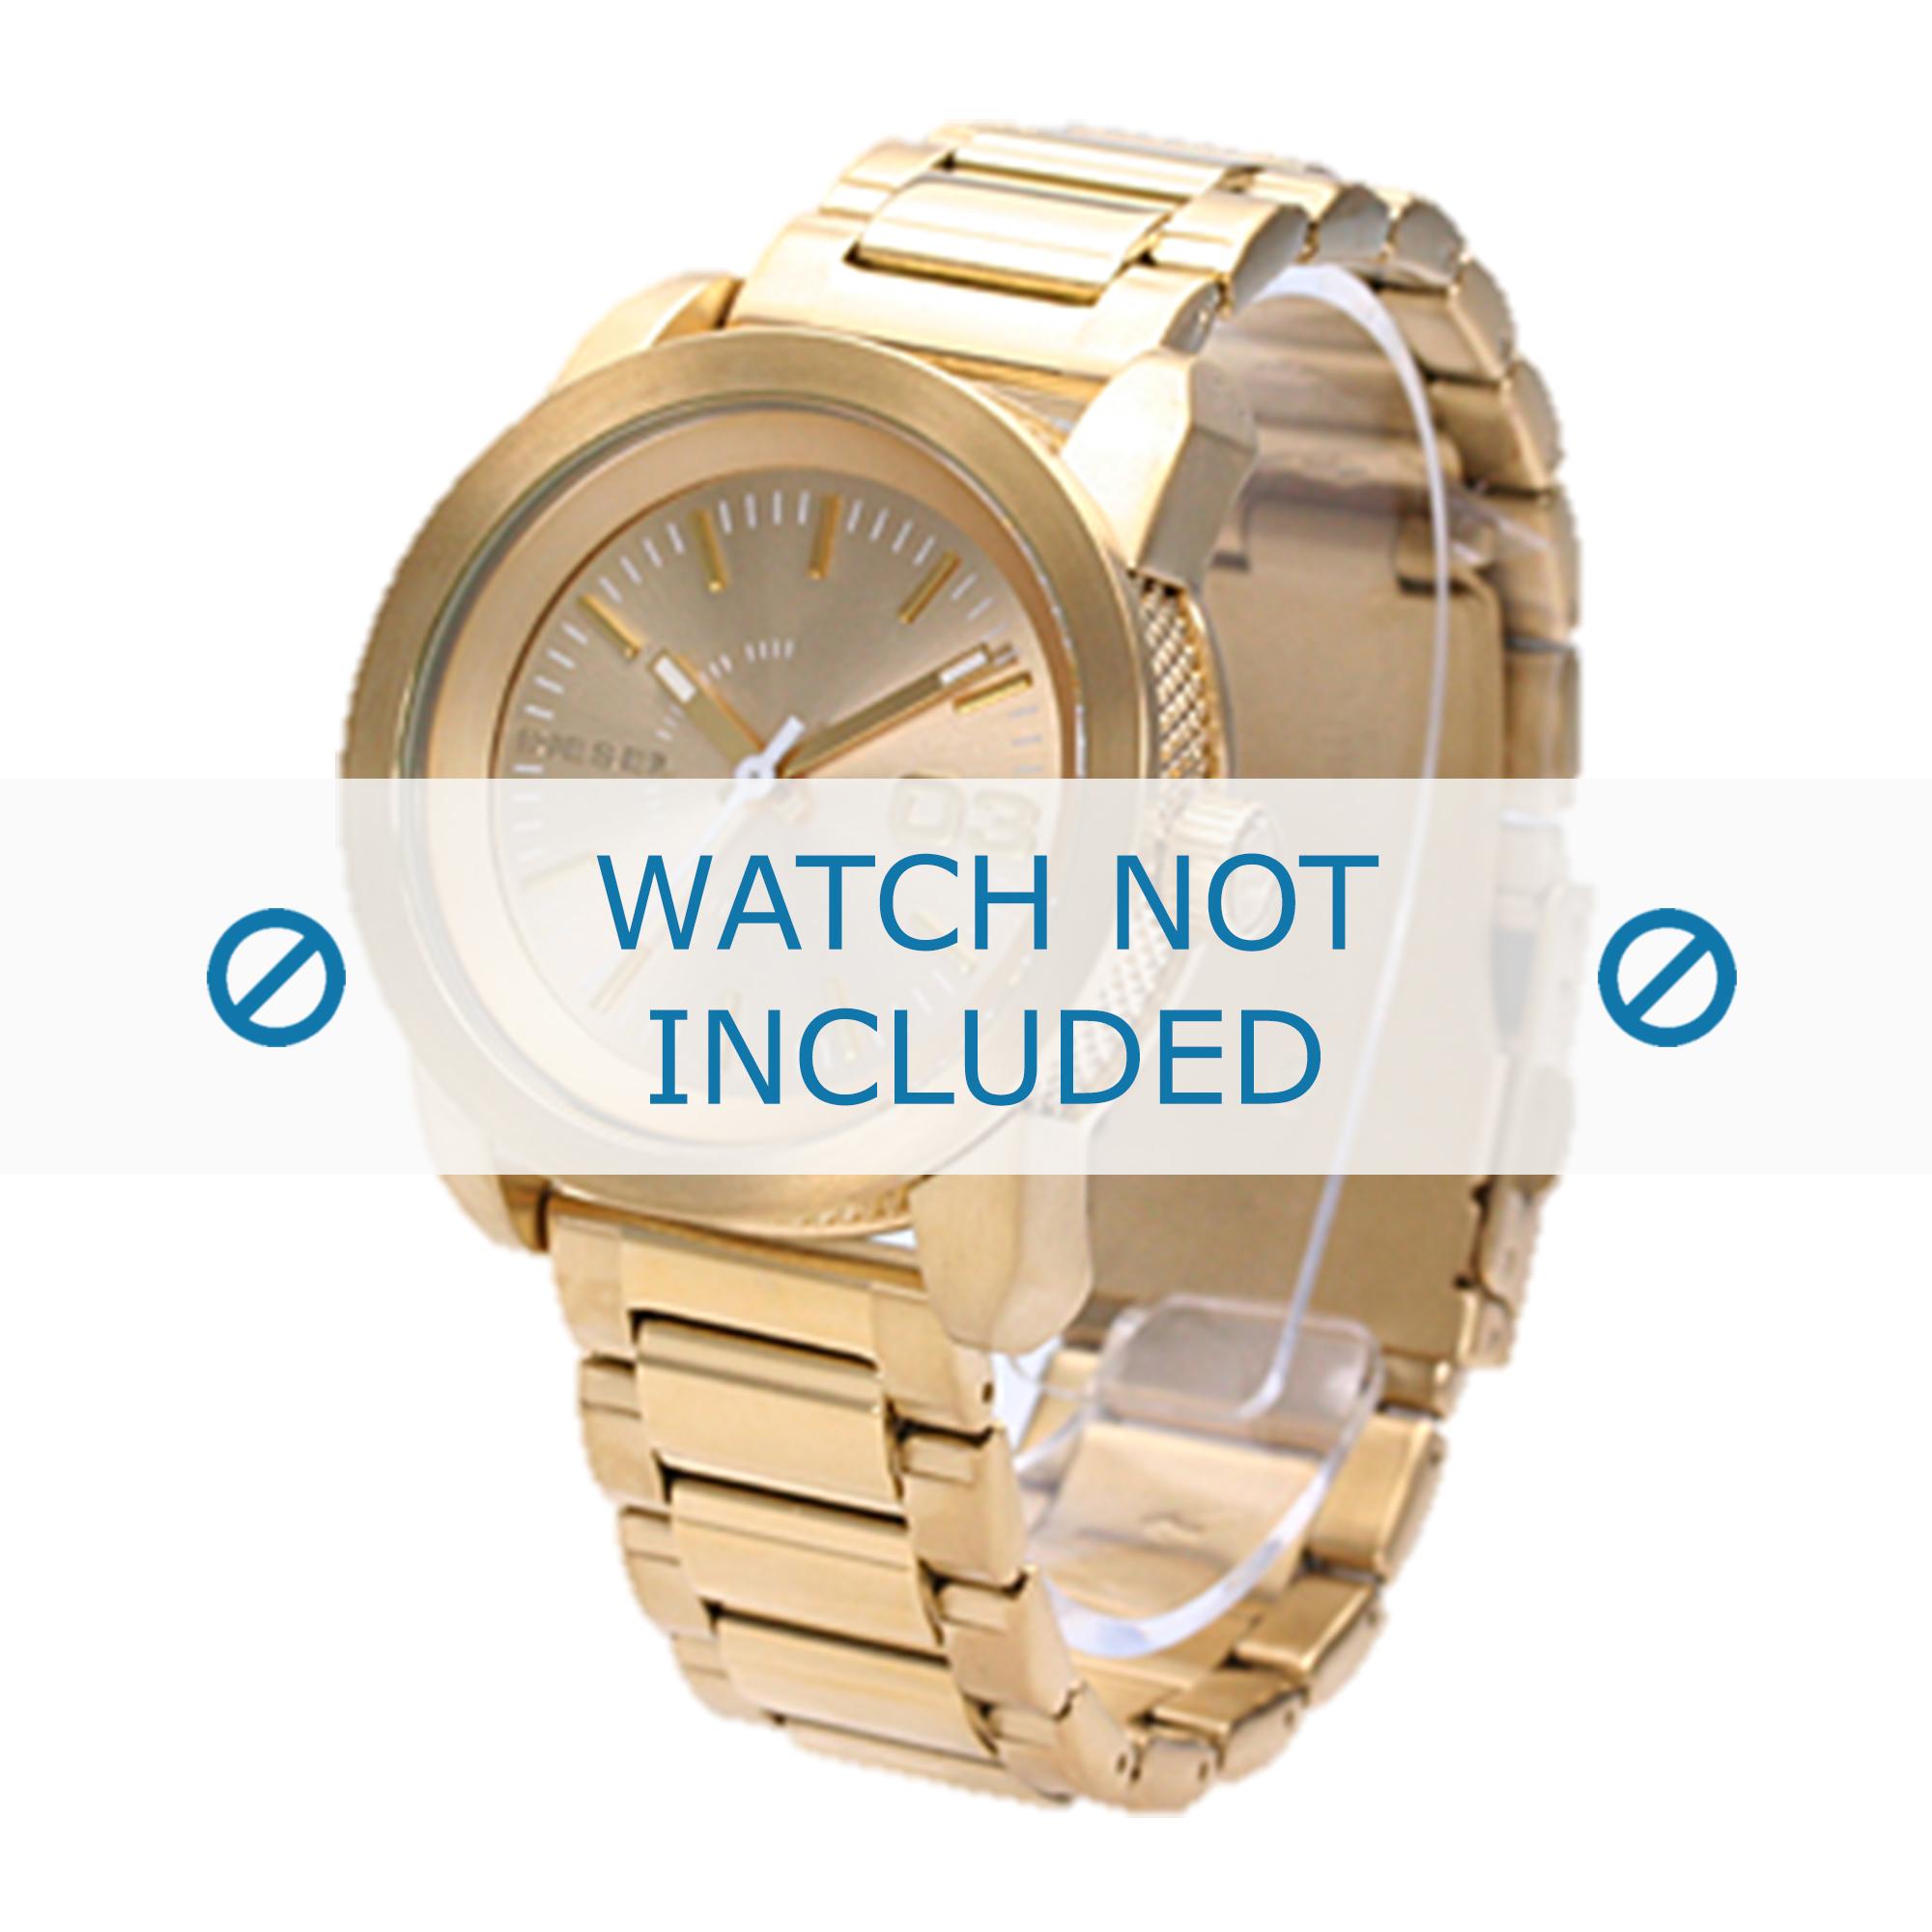 Diesel horlogeband DZ5234 Roestvrij staal (RVS) Goud 20mm